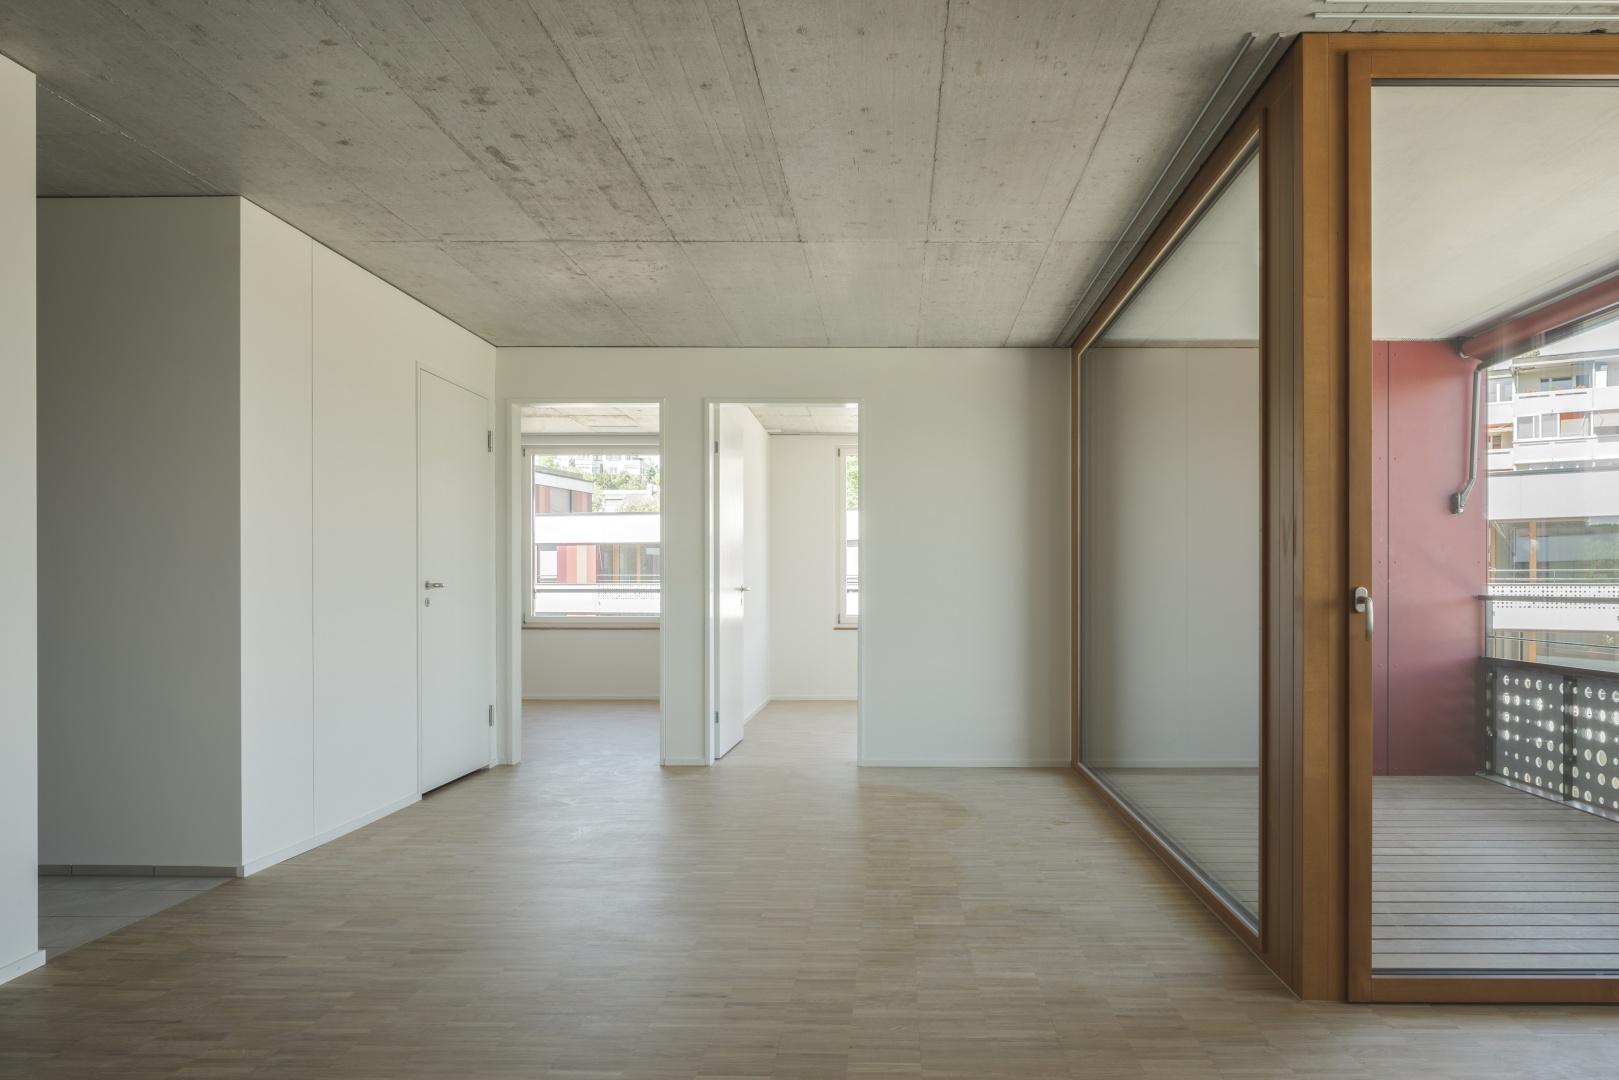 Innenraum Wohnung © Dominique Marc Wehrli, La-Chaux-de-Fonds